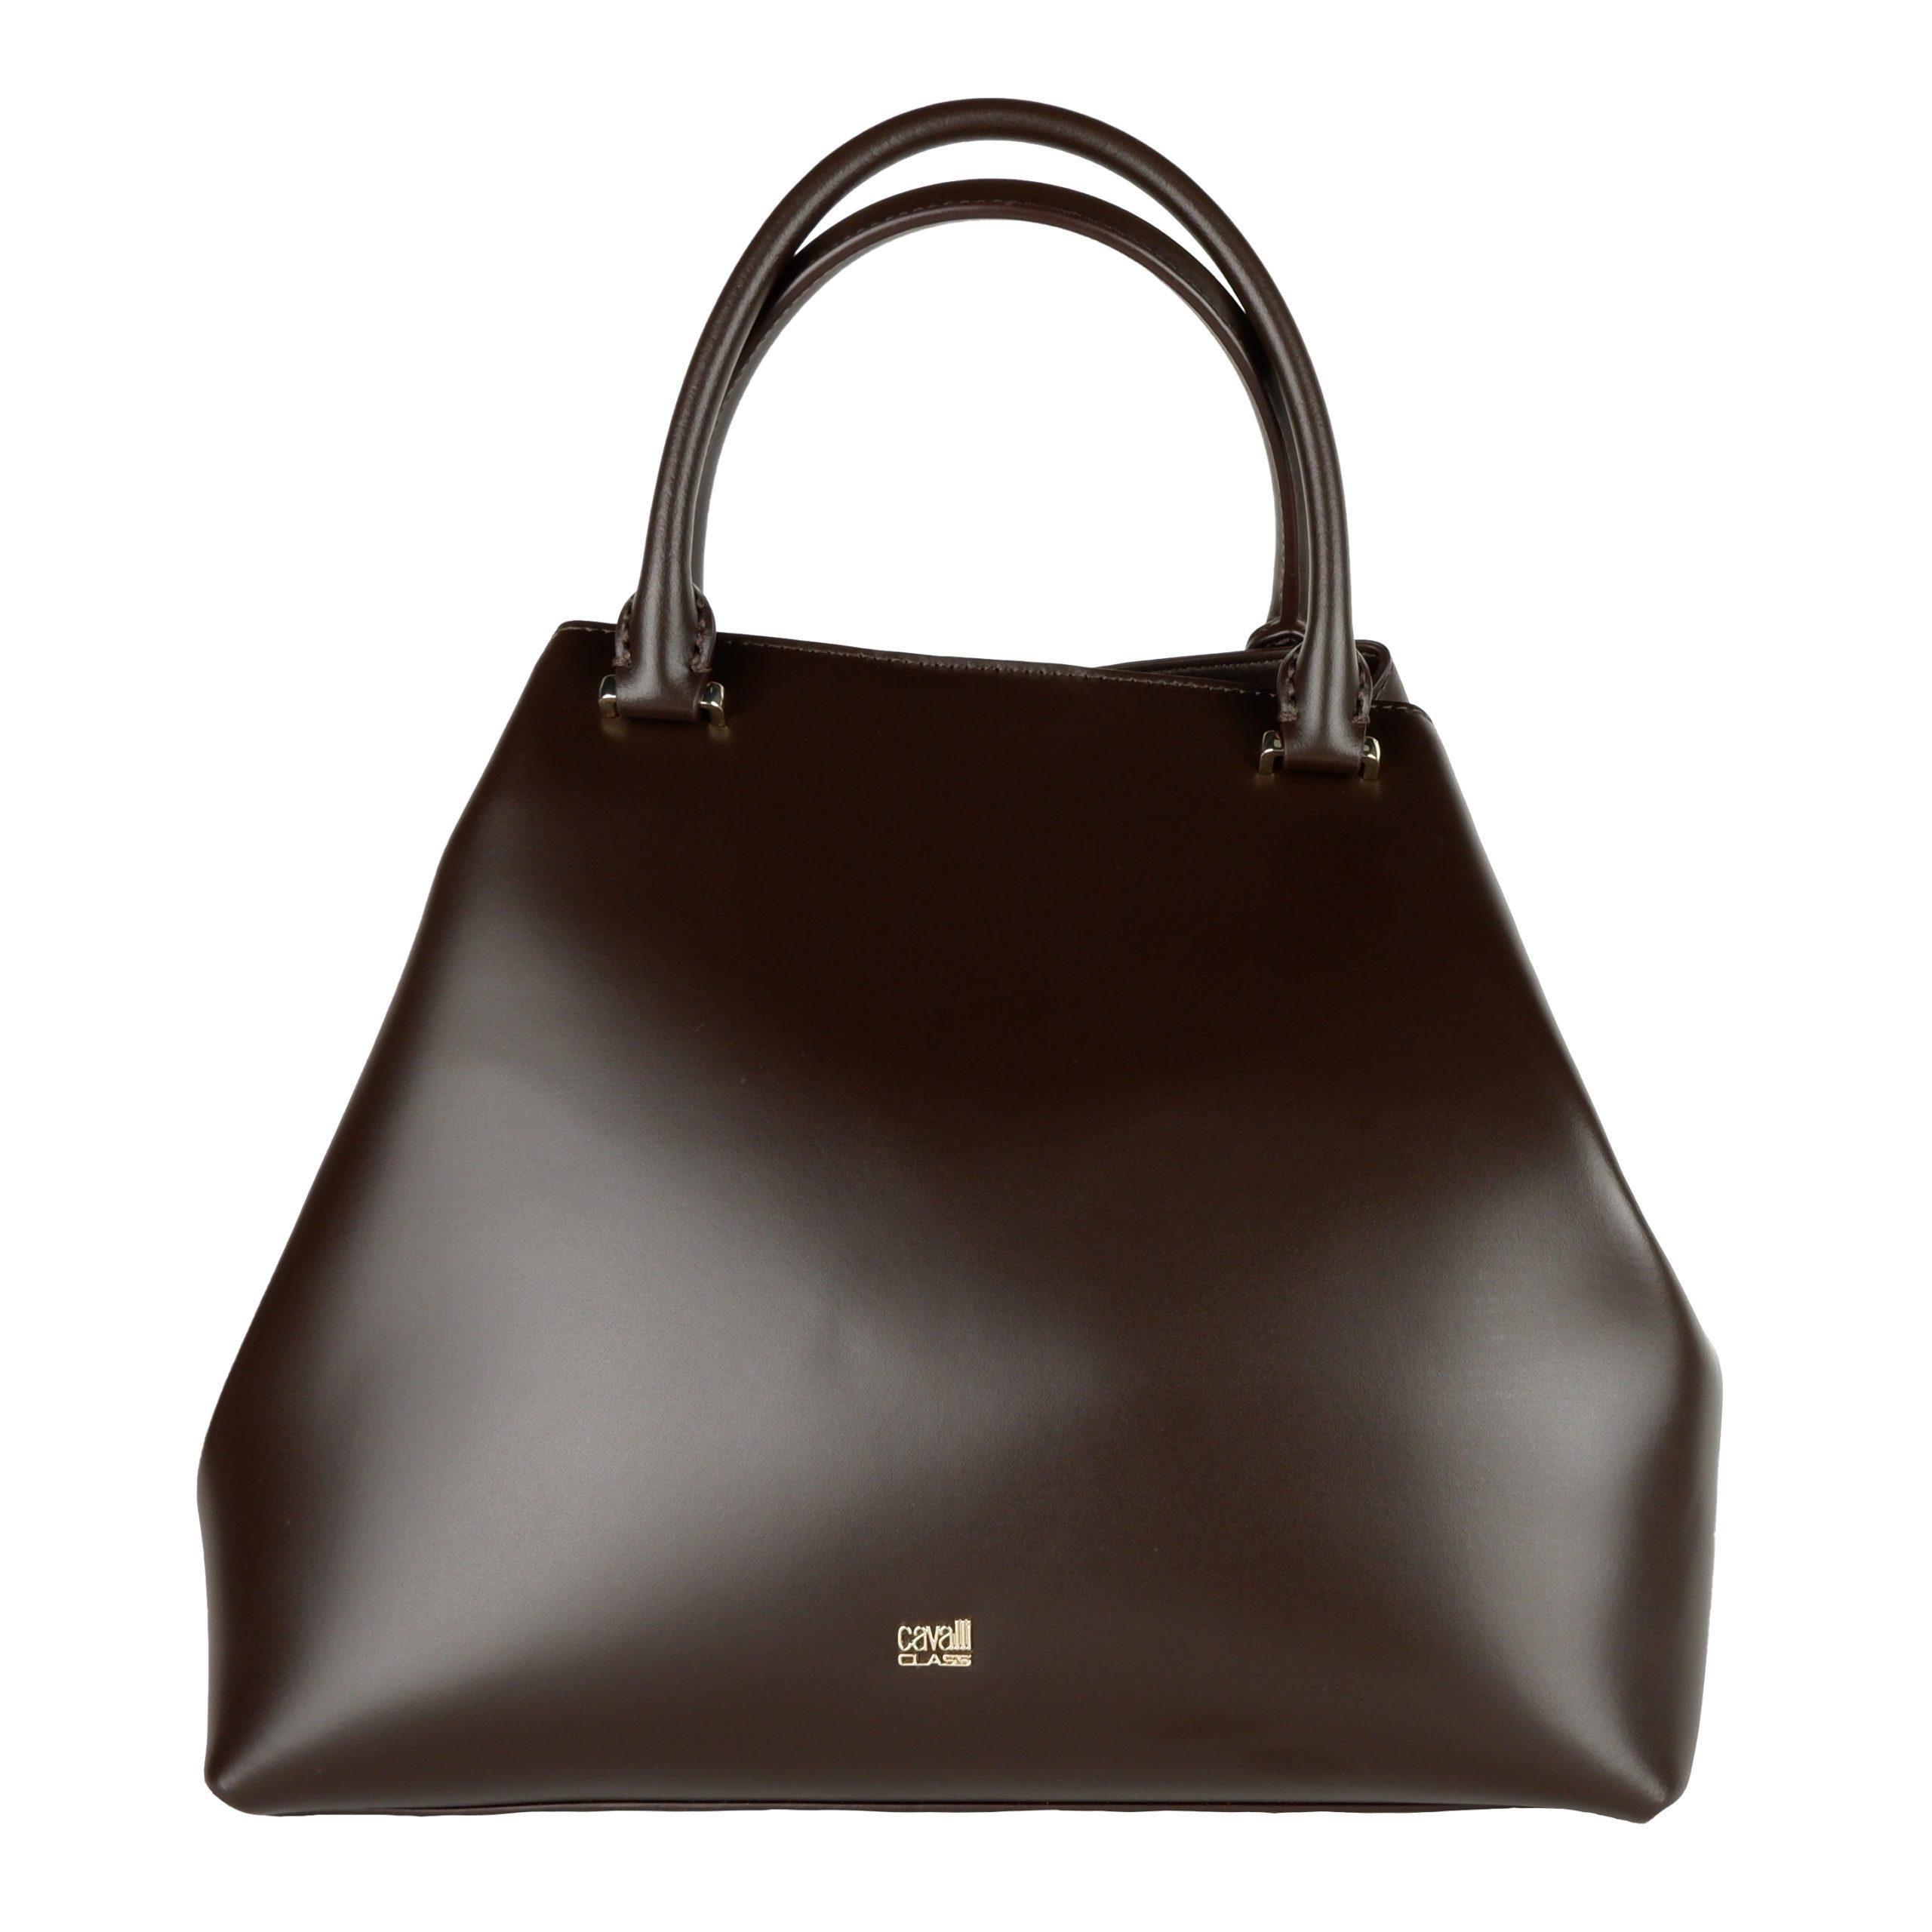 Cavalli Class Women's Handbag Dark Brown CA1421215